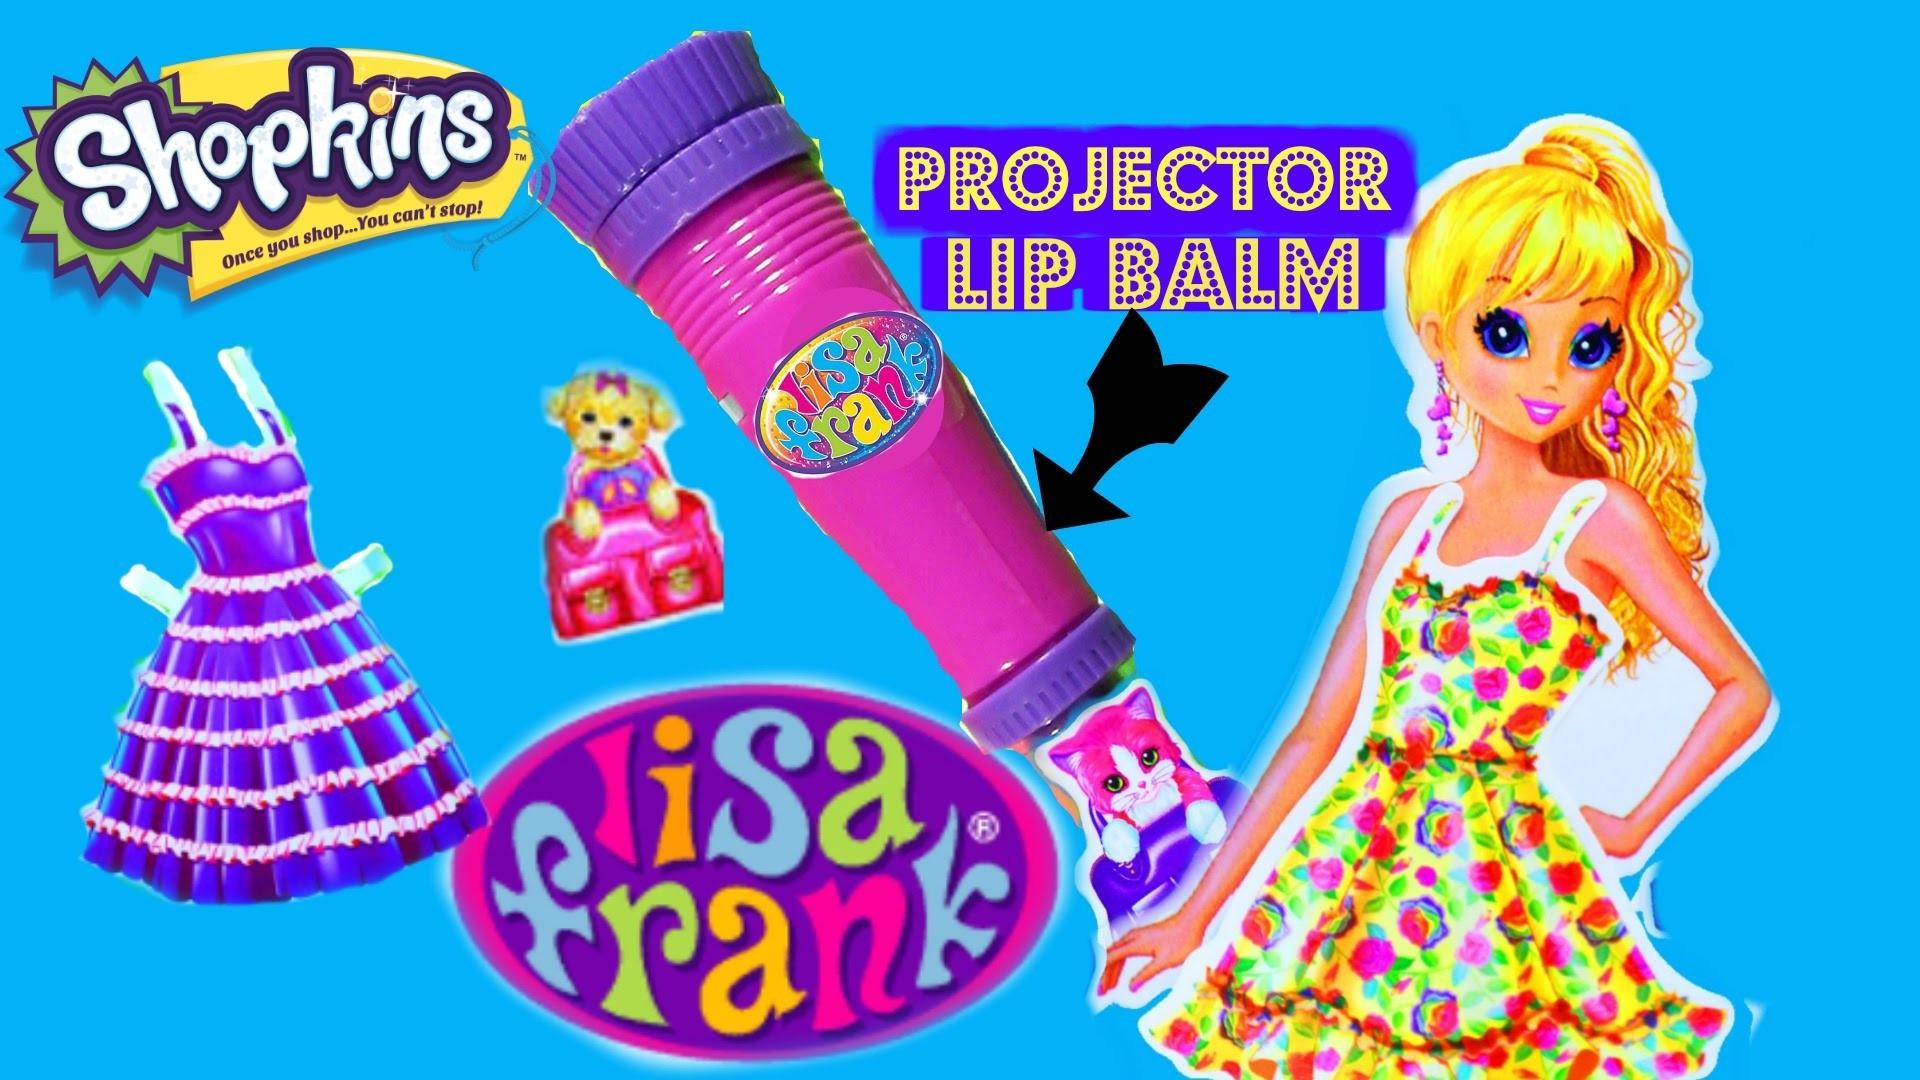 LISA FRANK ♥Beauty Projector Lip Balm (( Shopkins S4 Blind Crate )) Sticker  Doll Dress-up ♥ Laci